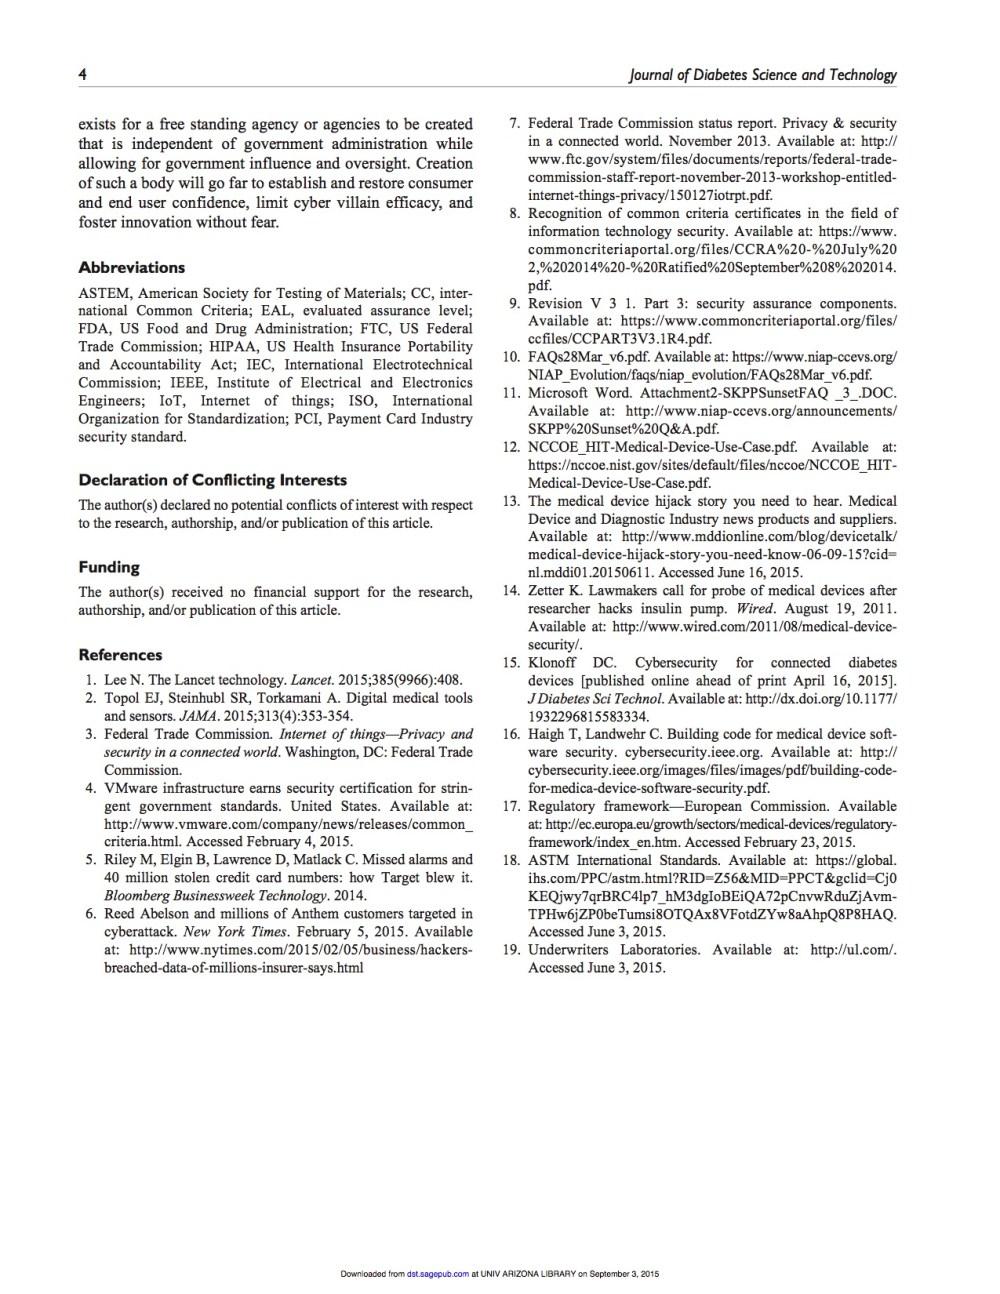 Medjacking J Diabetes Sci Technol-2015-Armstrong-1932296815602100